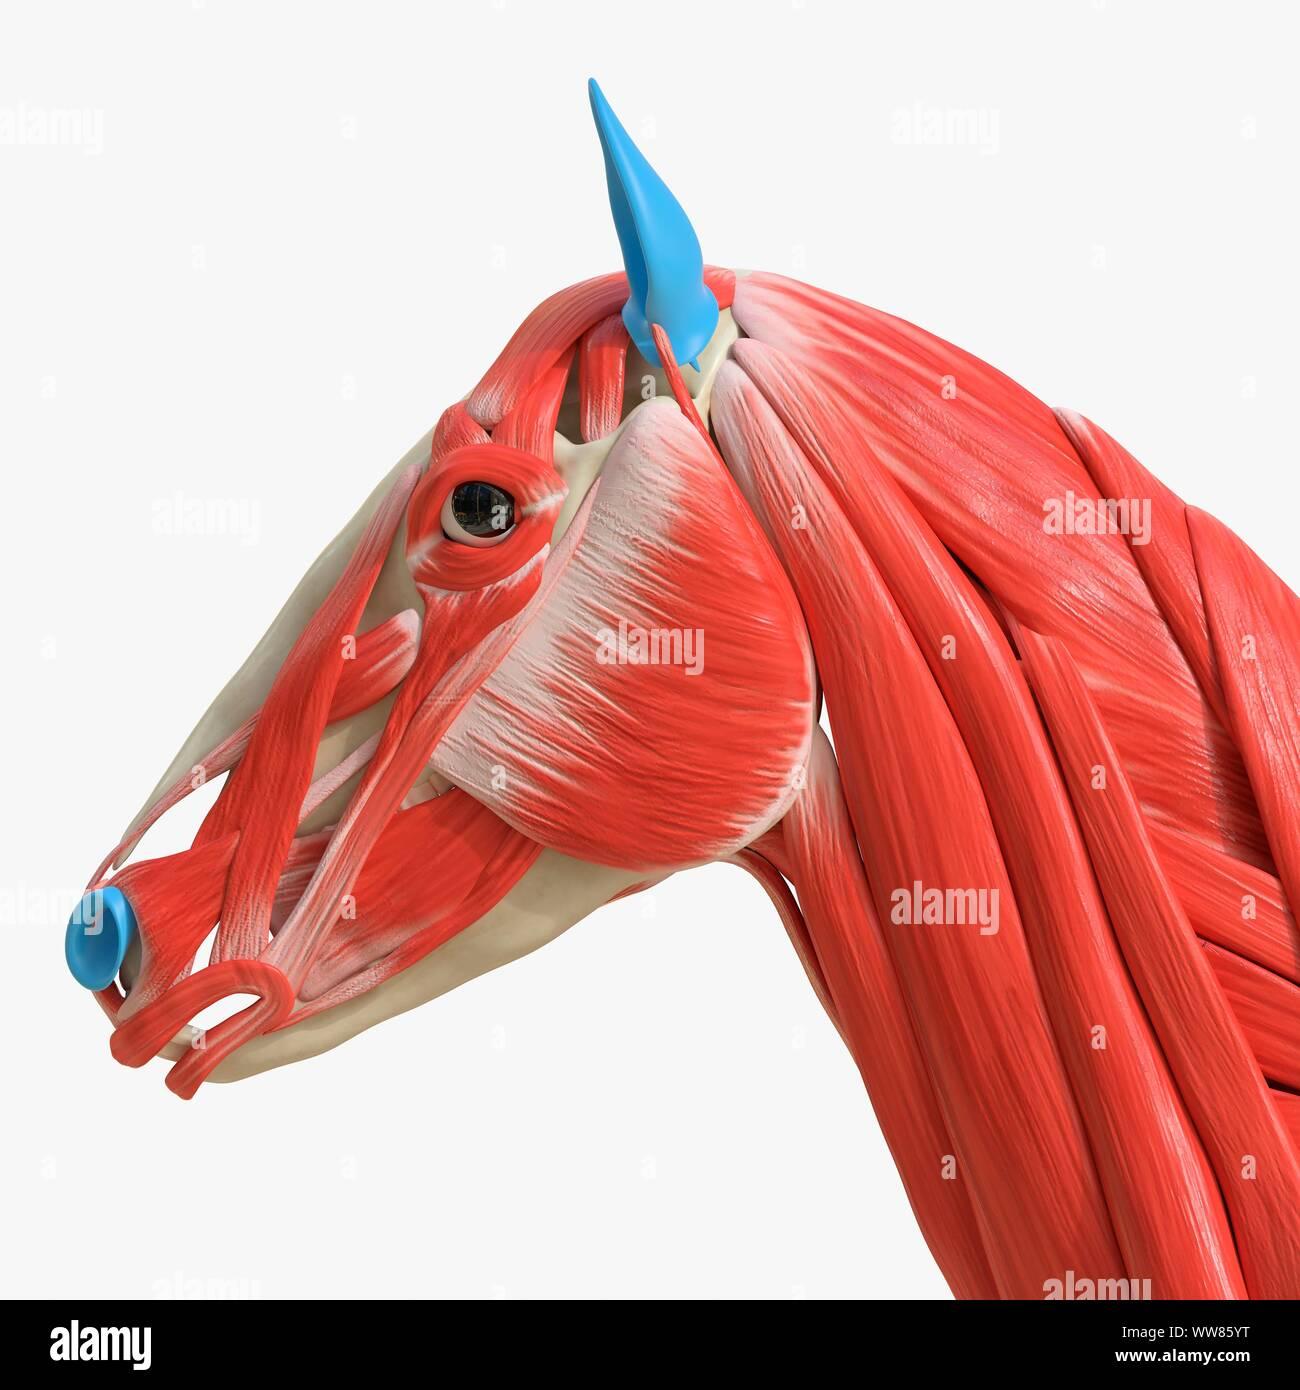 Horse Head Muscles Illustration Stock Photo Alamy